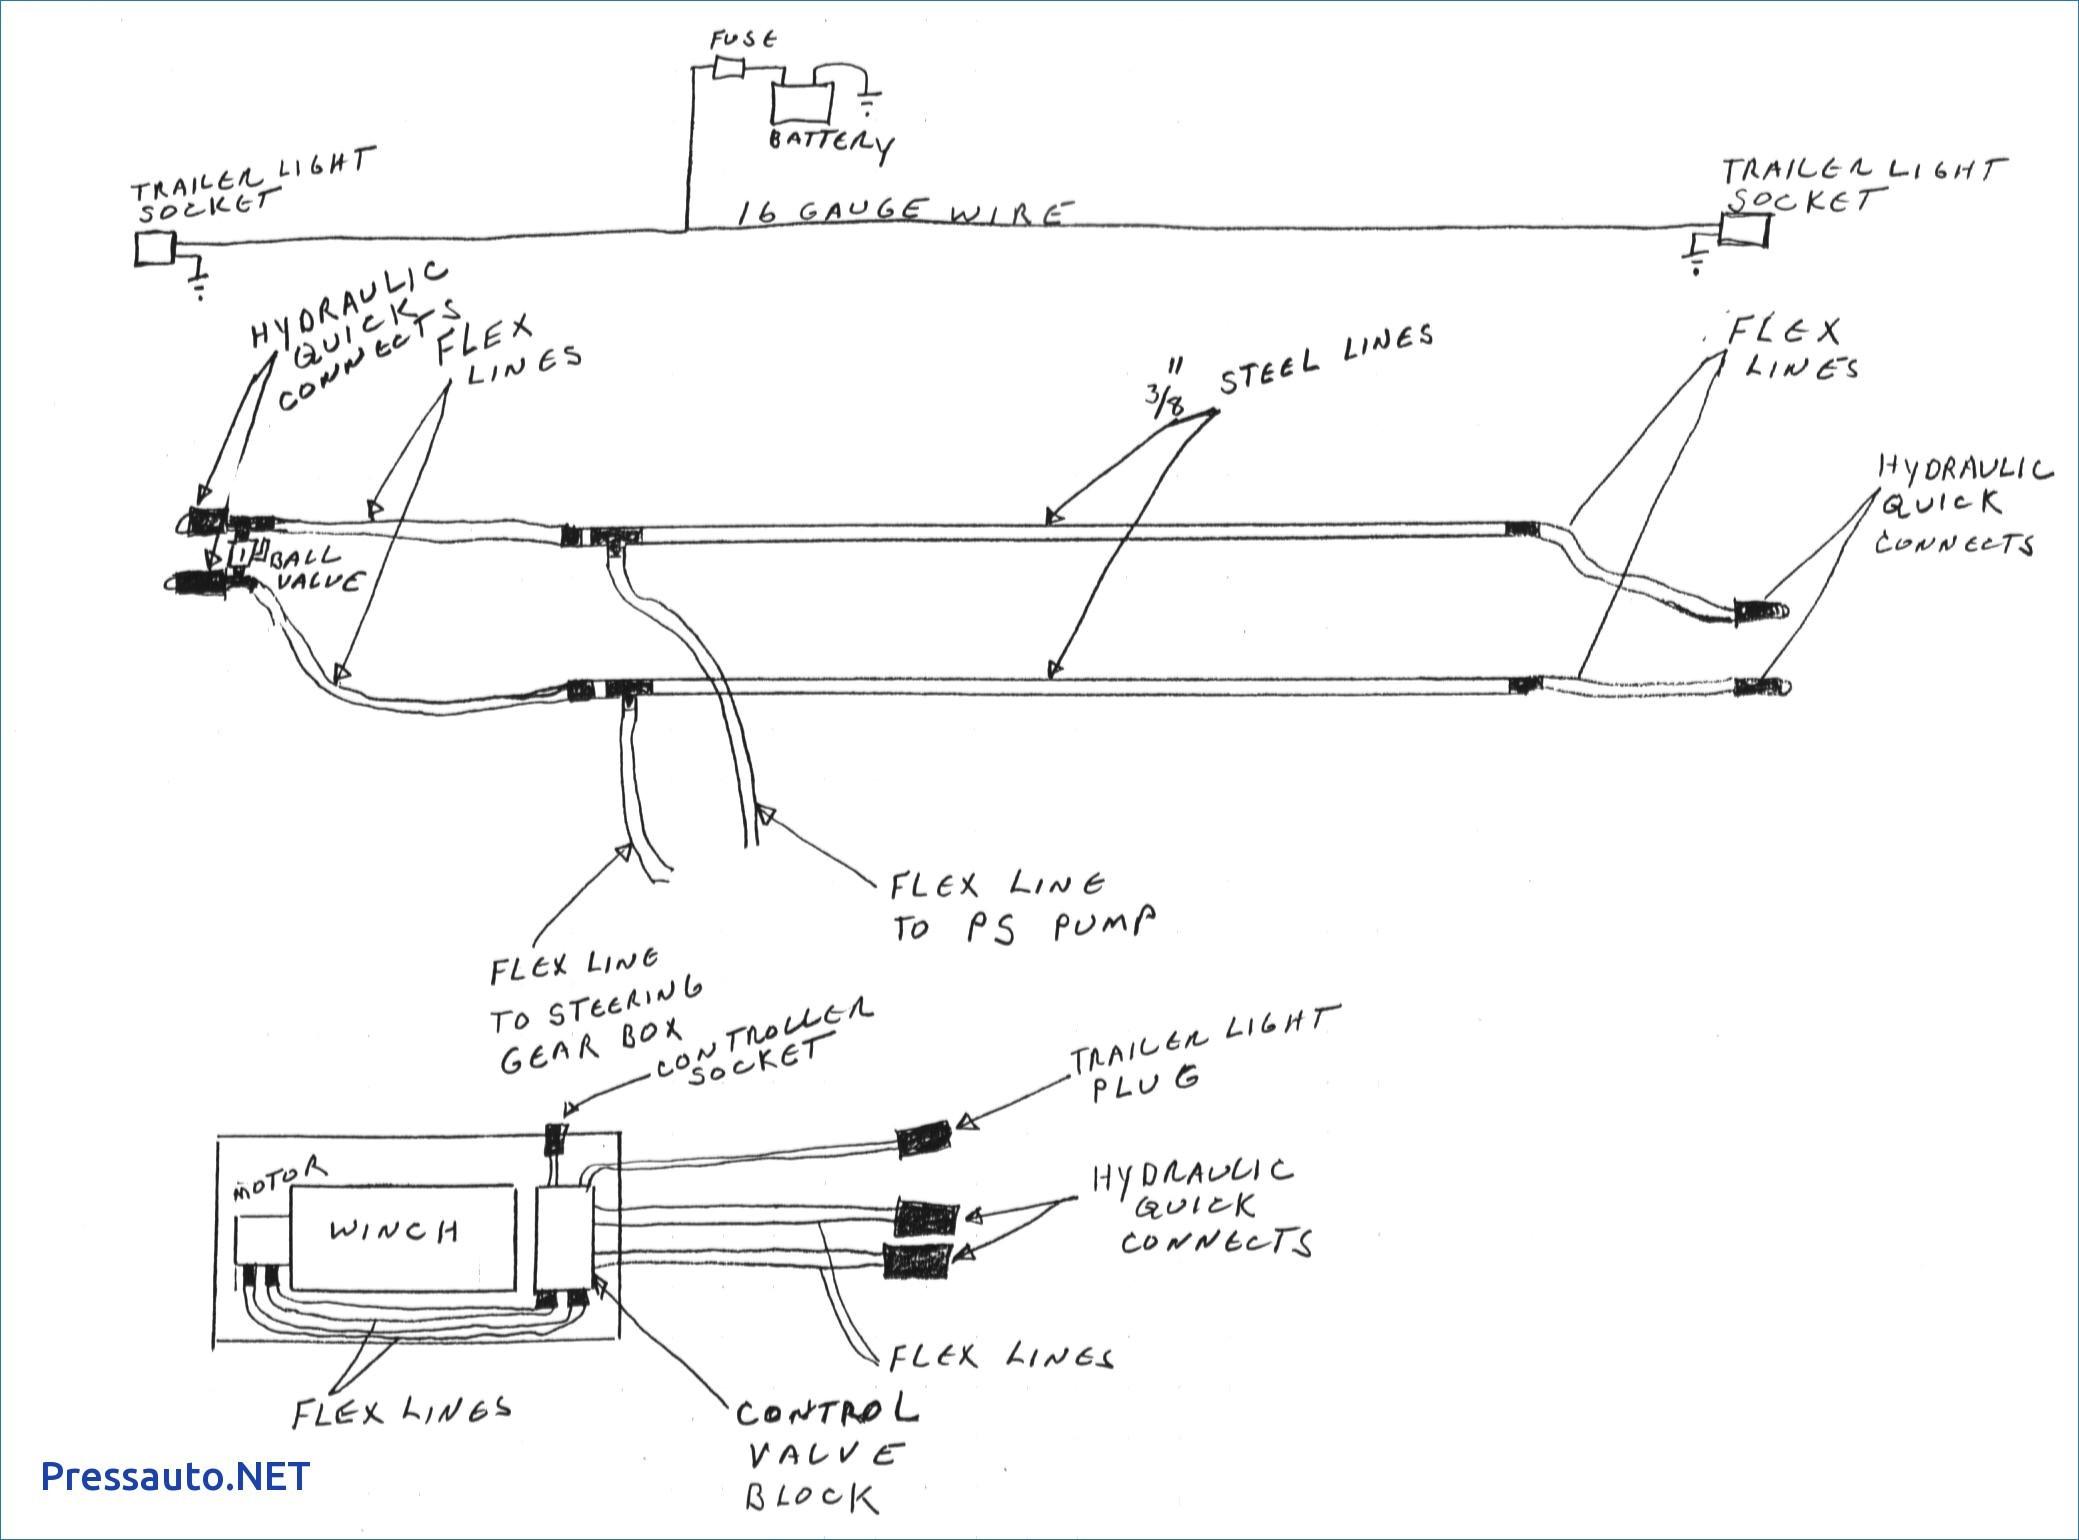 badland winches control box indexnewspaper com. Black Bedroom Furniture Sets. Home Design Ideas